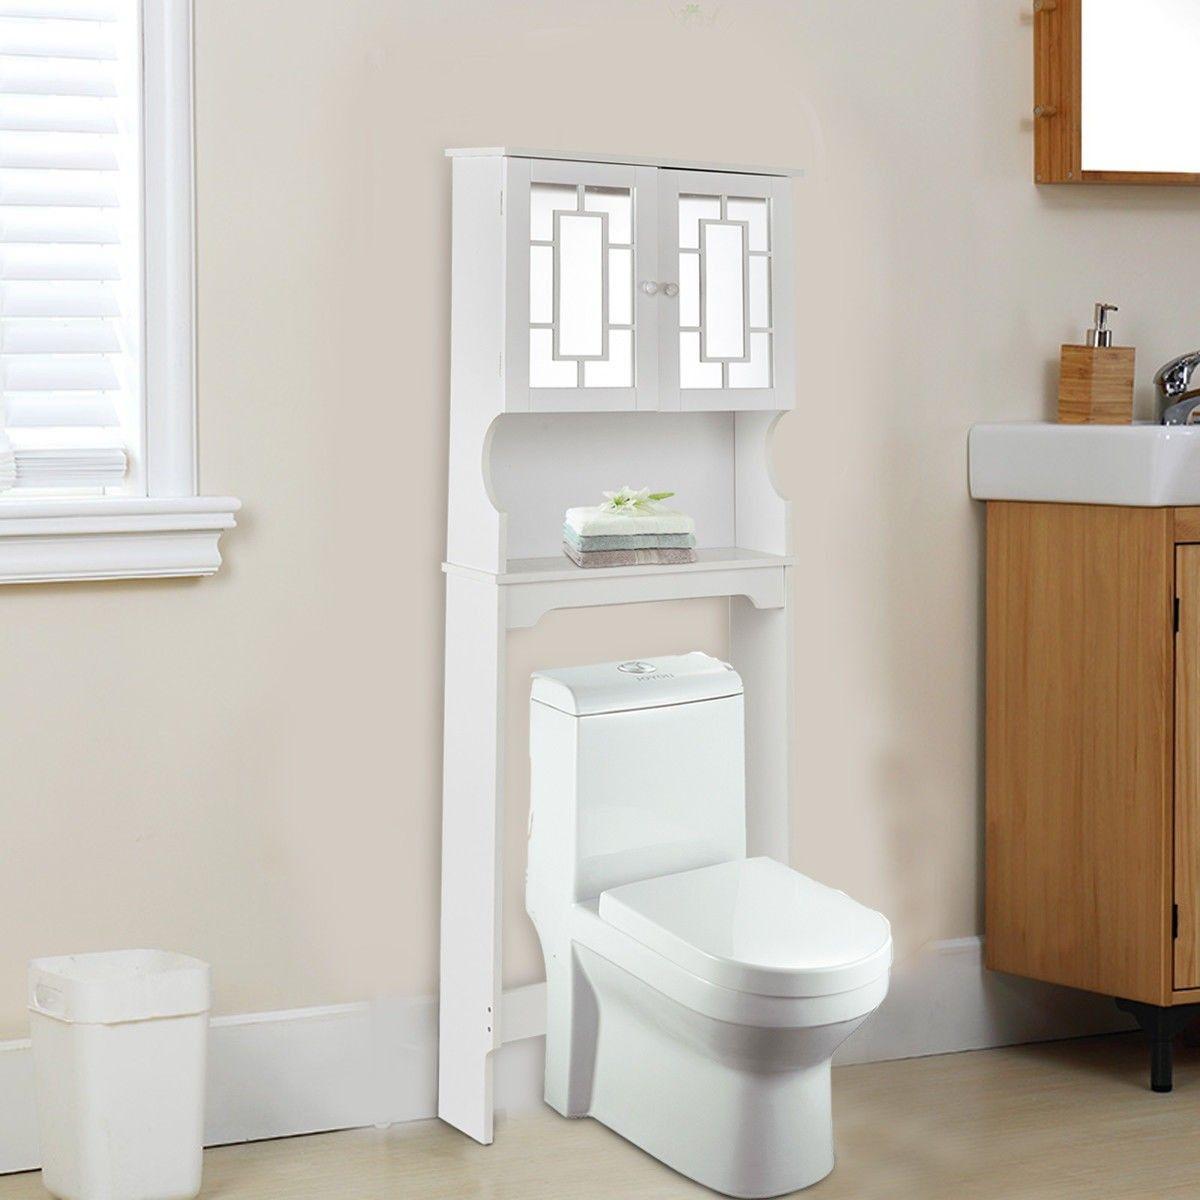 Bathroom Over Toilet Space Saver #Storage Cabinet Shelf | Hardware ...